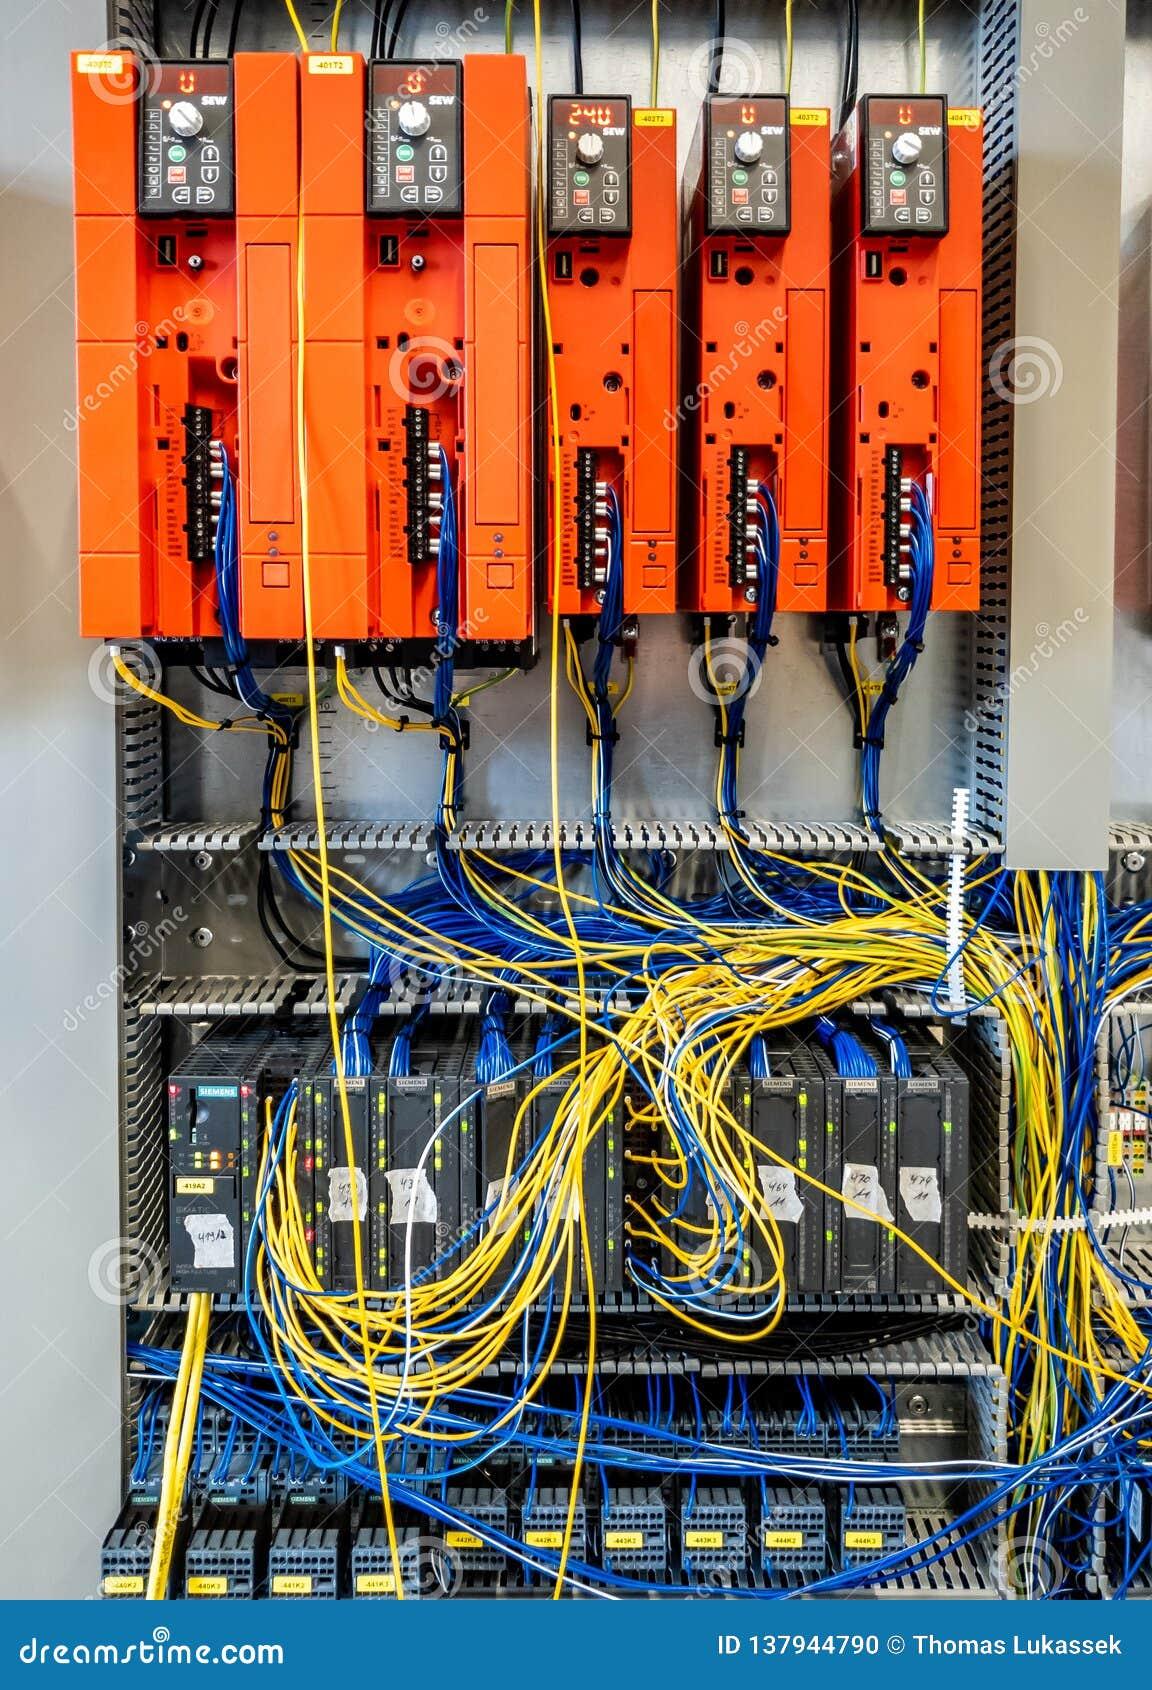 Dinslaken, Γερμανία - 19 Σεπτεμβρίου 2018: ΡΑΨΤΕ τον ελεγκτή Freuqency και το PLC παίρνει έτοιμο για την παραγωγή